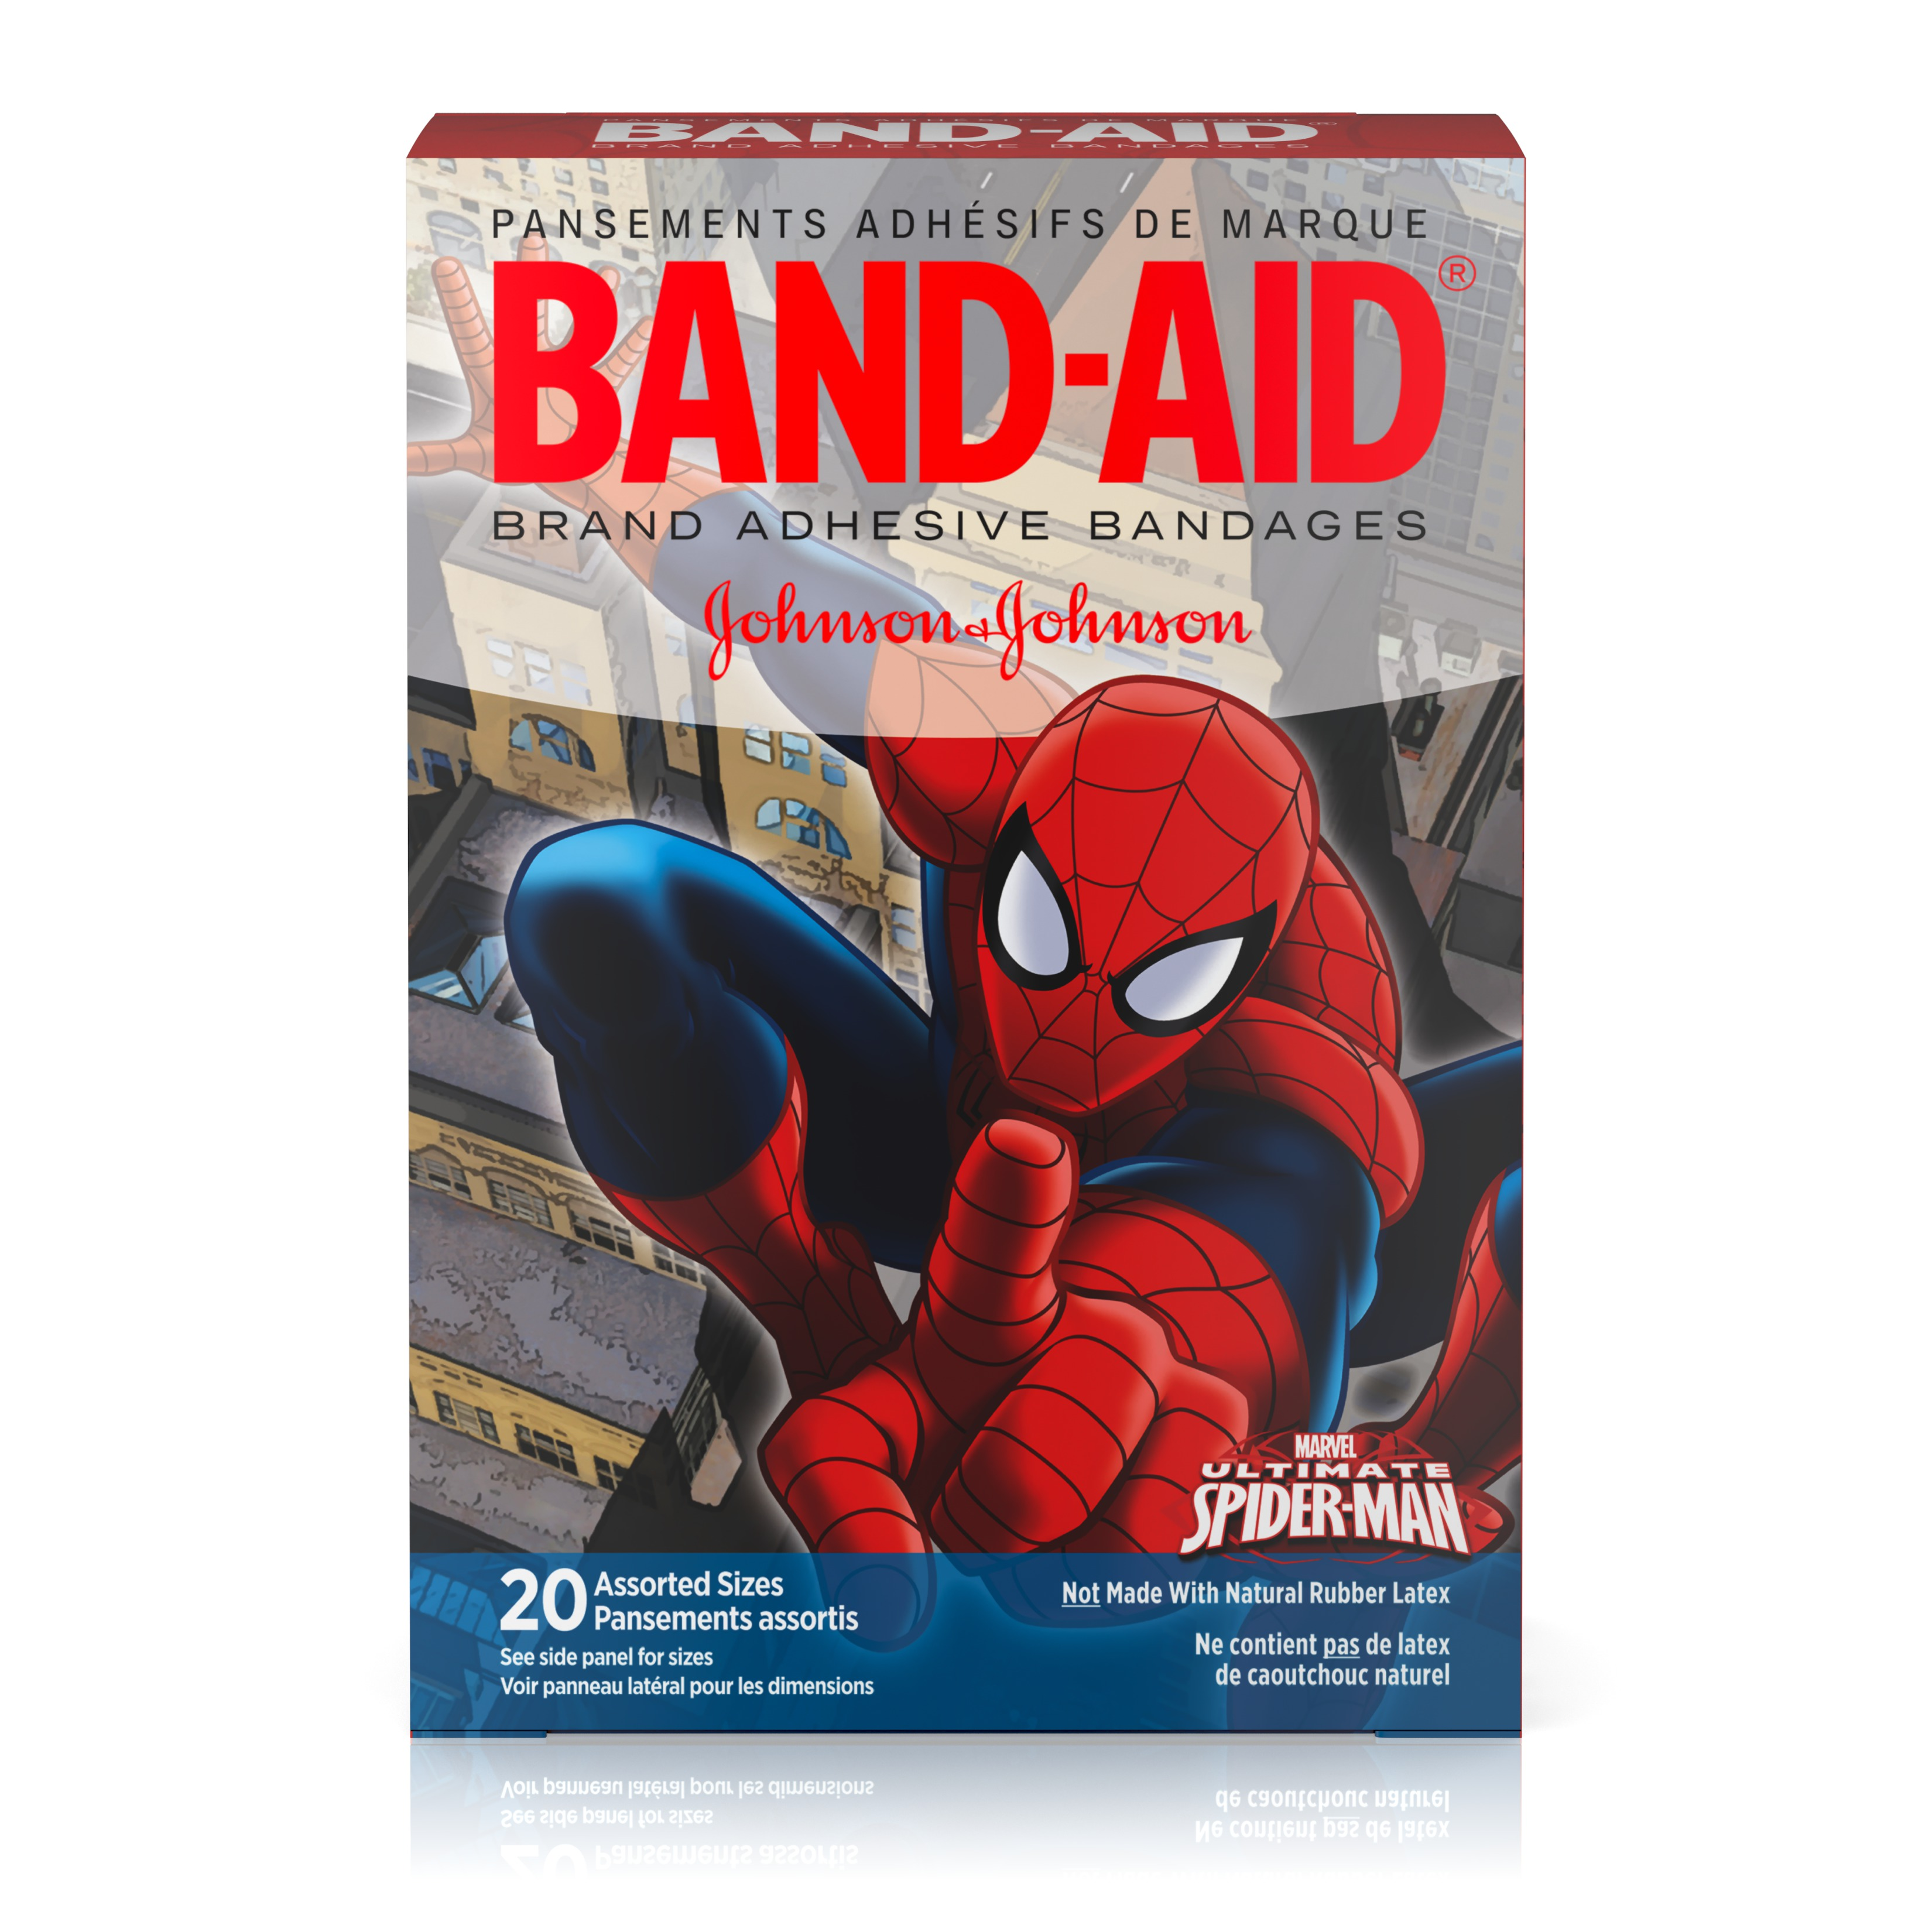 Band-Aid Adhesive Bandages, Marvel Spiderman, Assorted Sizes 20 ct